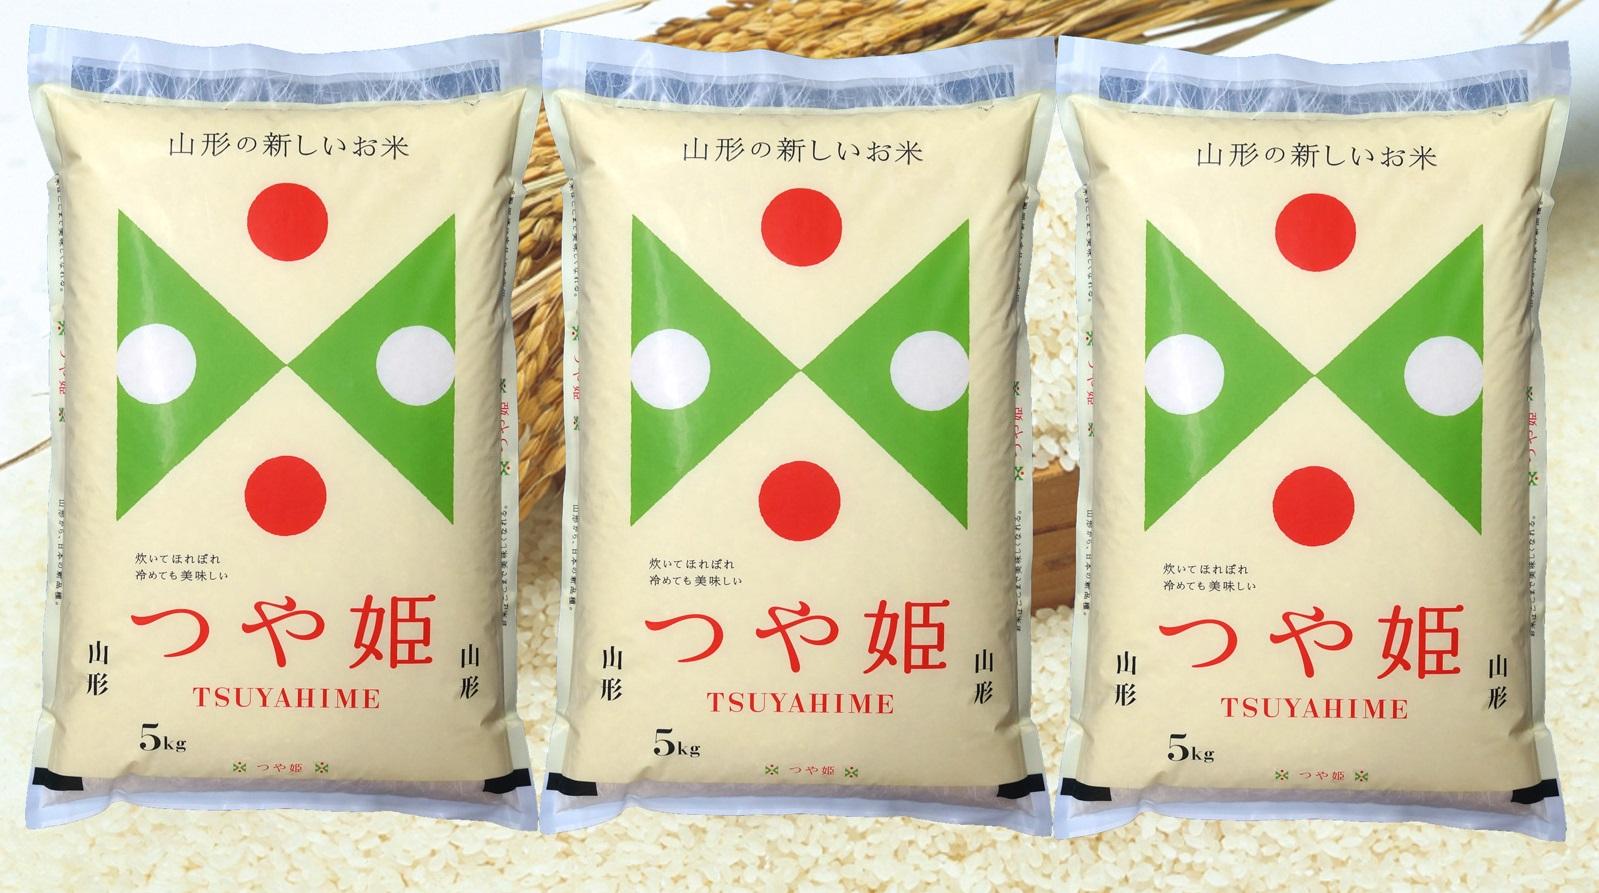 平成29年度産米 つや姫15kg 寄附金額10,000円